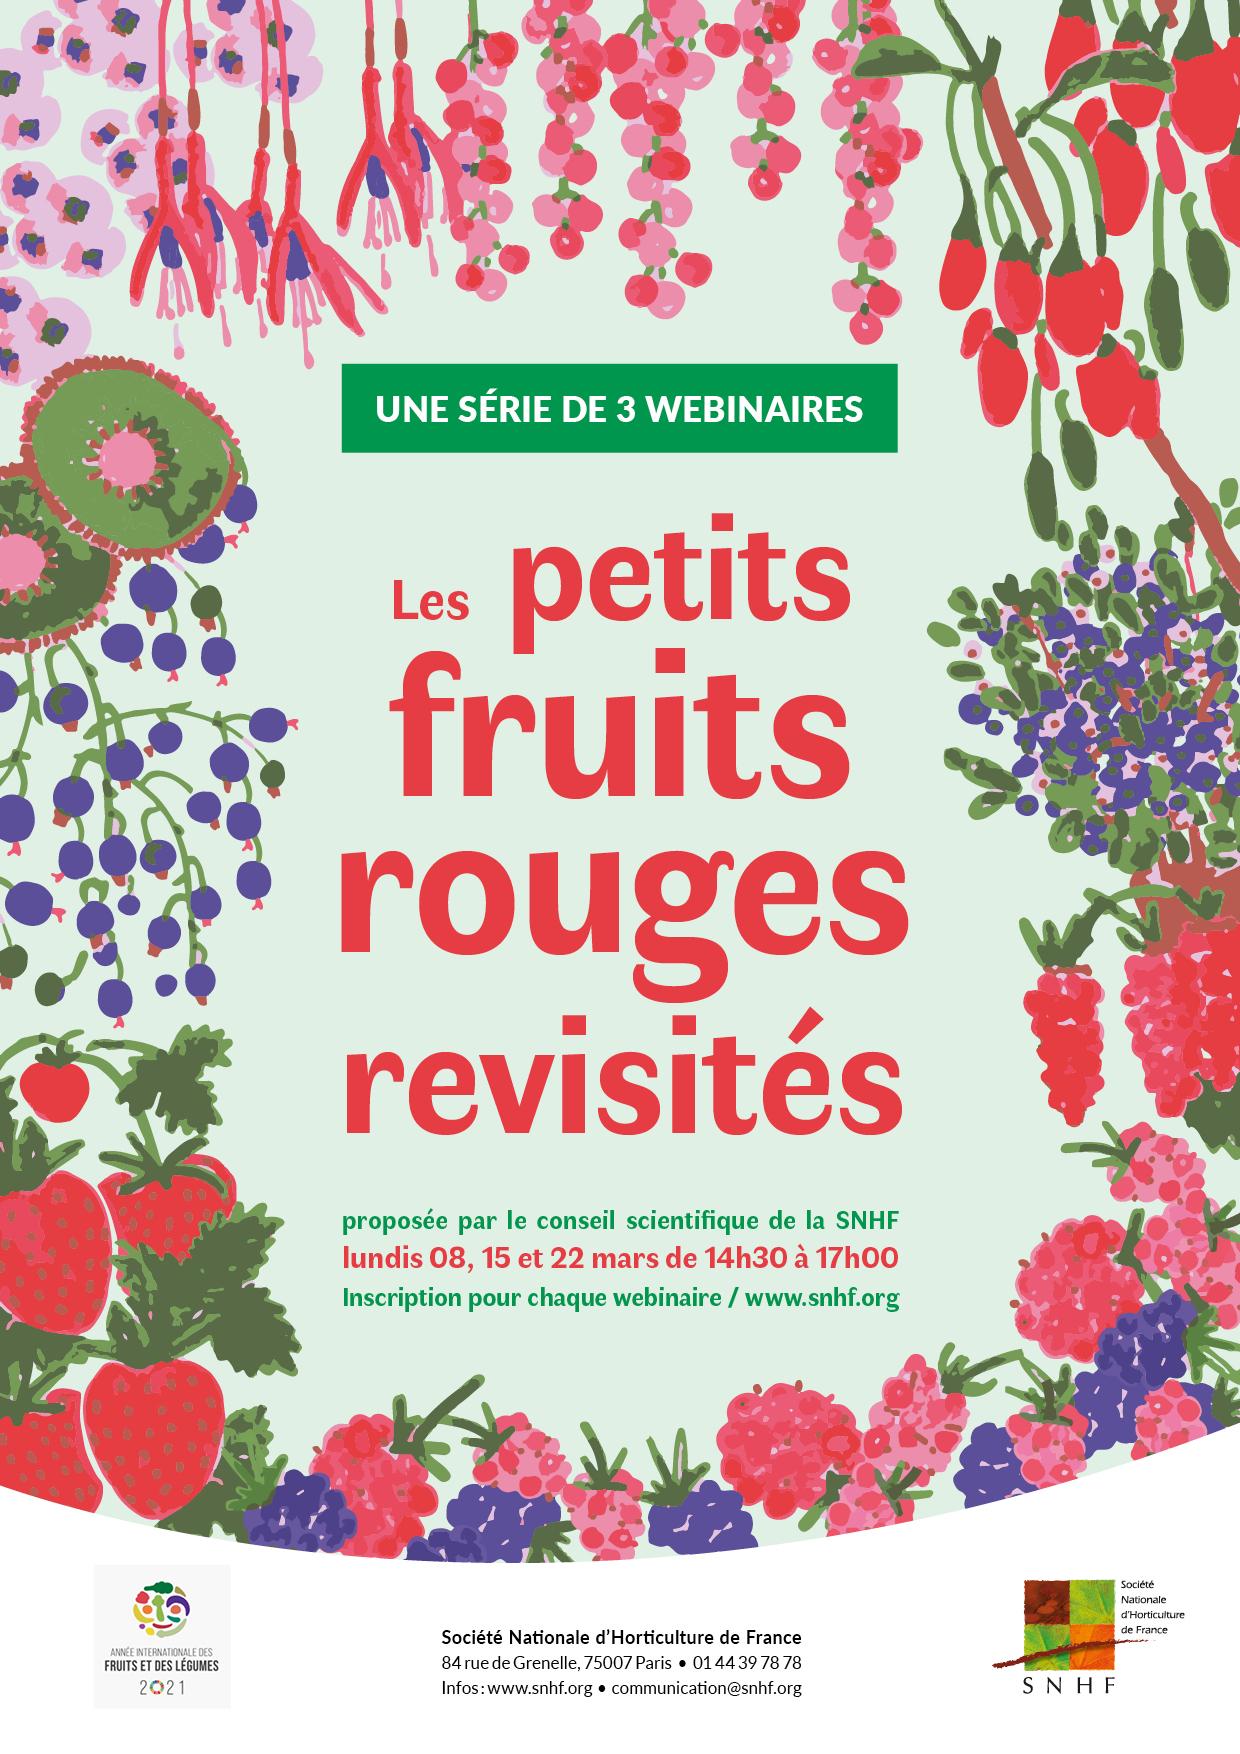 JI 2021 Les petits fruits rouges revisités